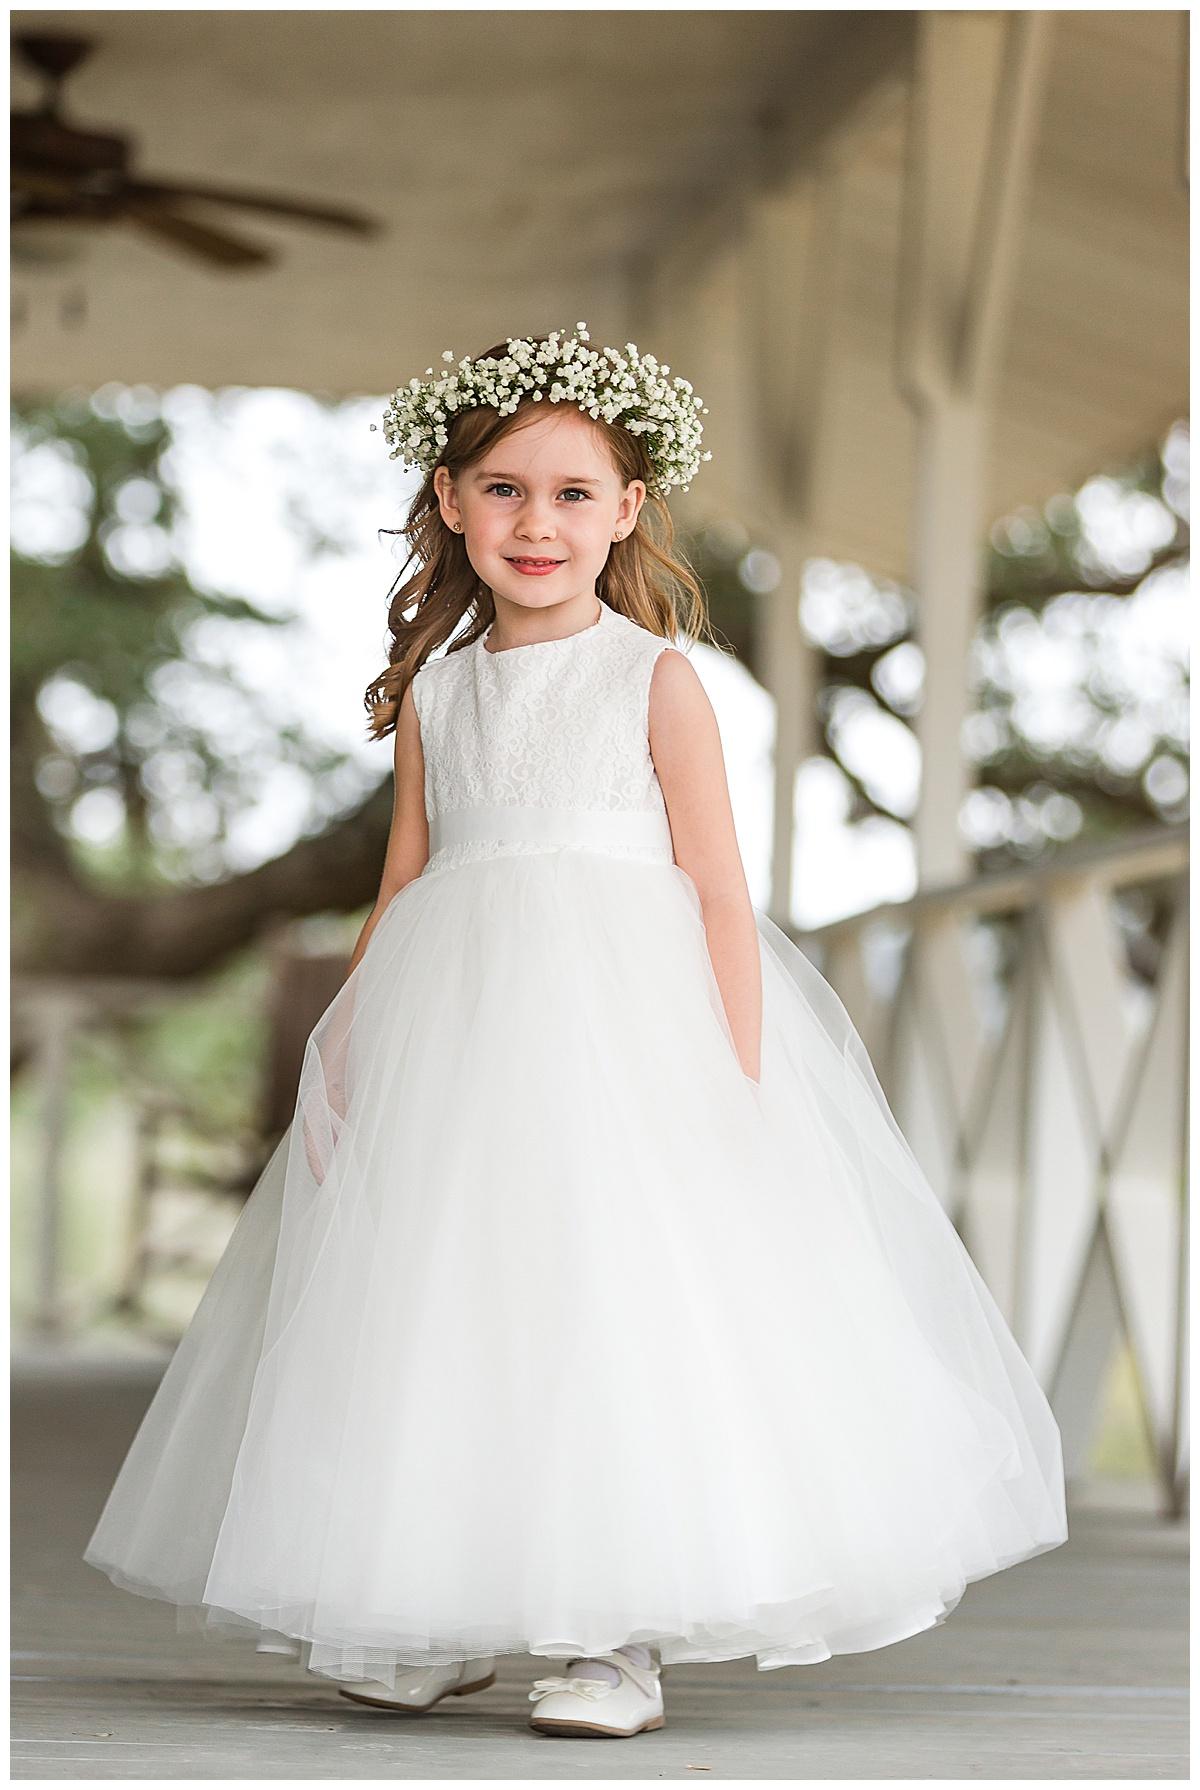 Wedding-Photographer-Texas-Hill-Country-Happy-H-Ranch-Comfor-Texas-Carly-Barton-Photography_0015.jpg